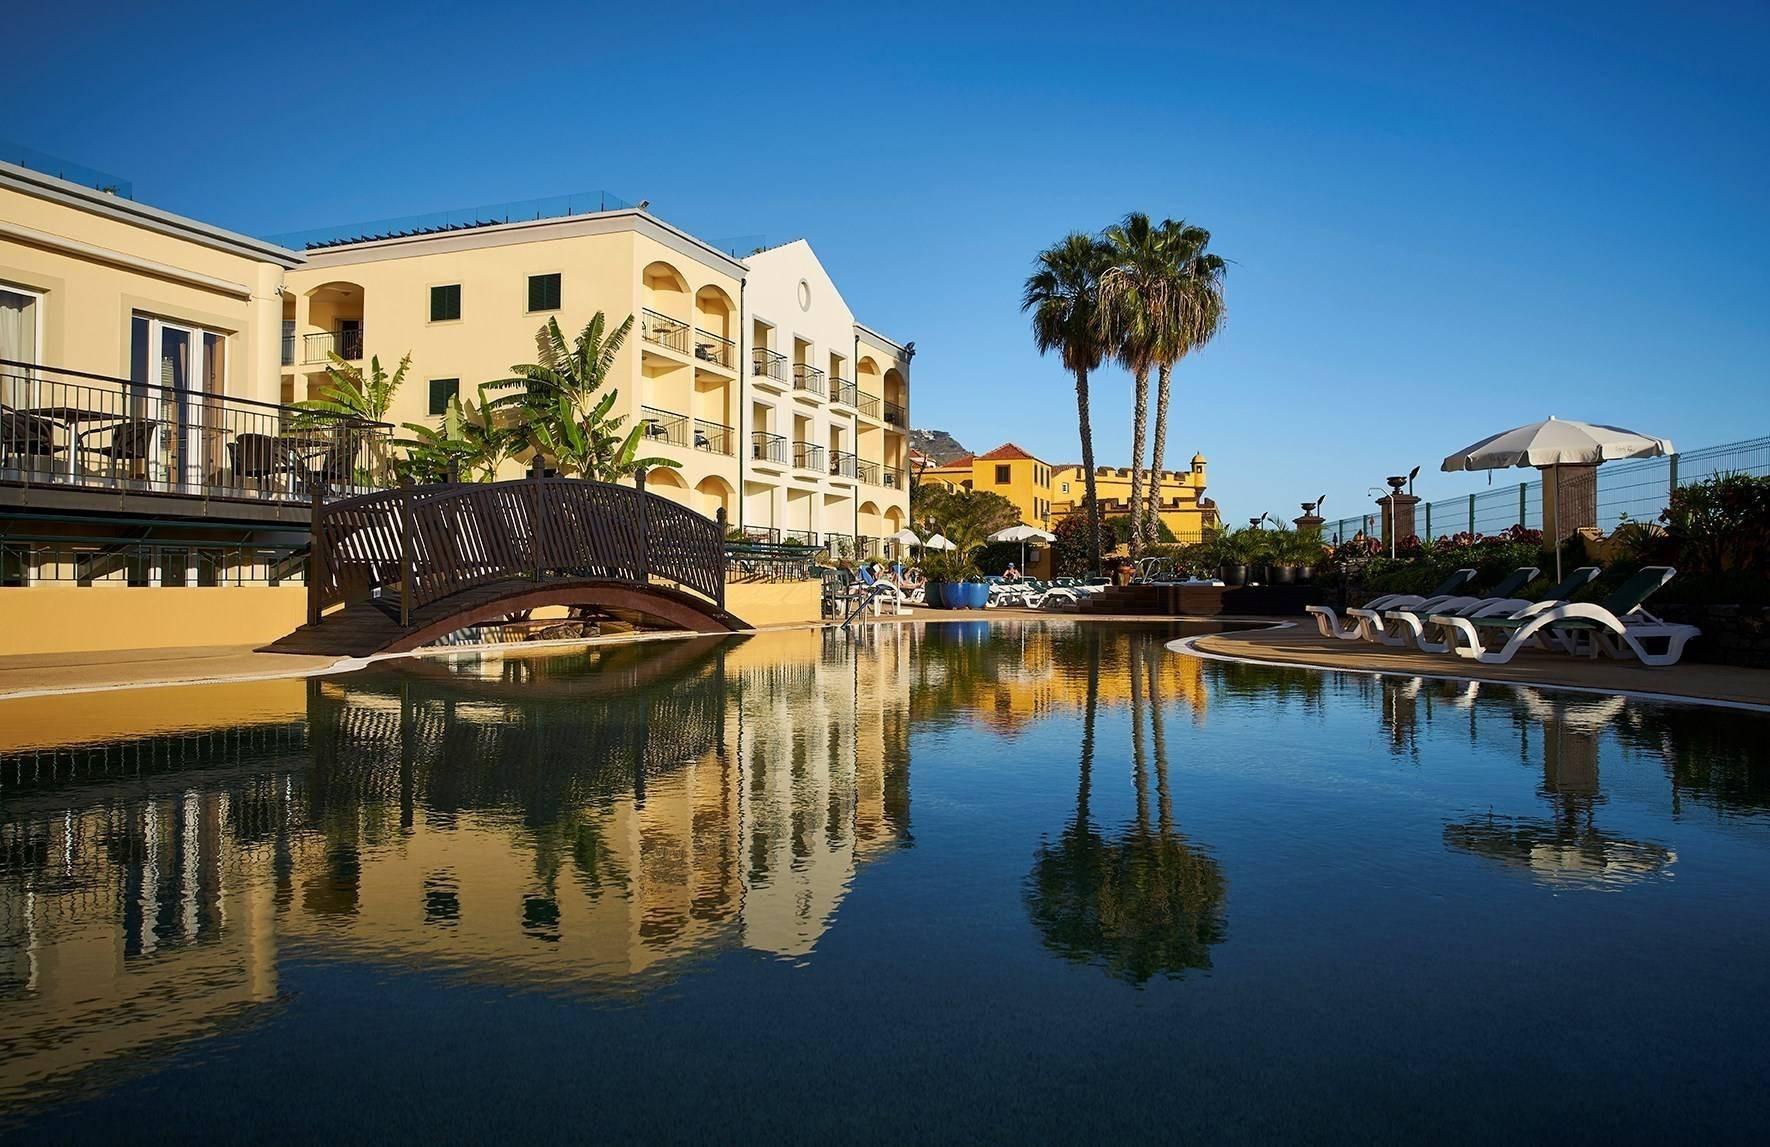 Hotel Porto Santa Maria - Madeira Island - Overview